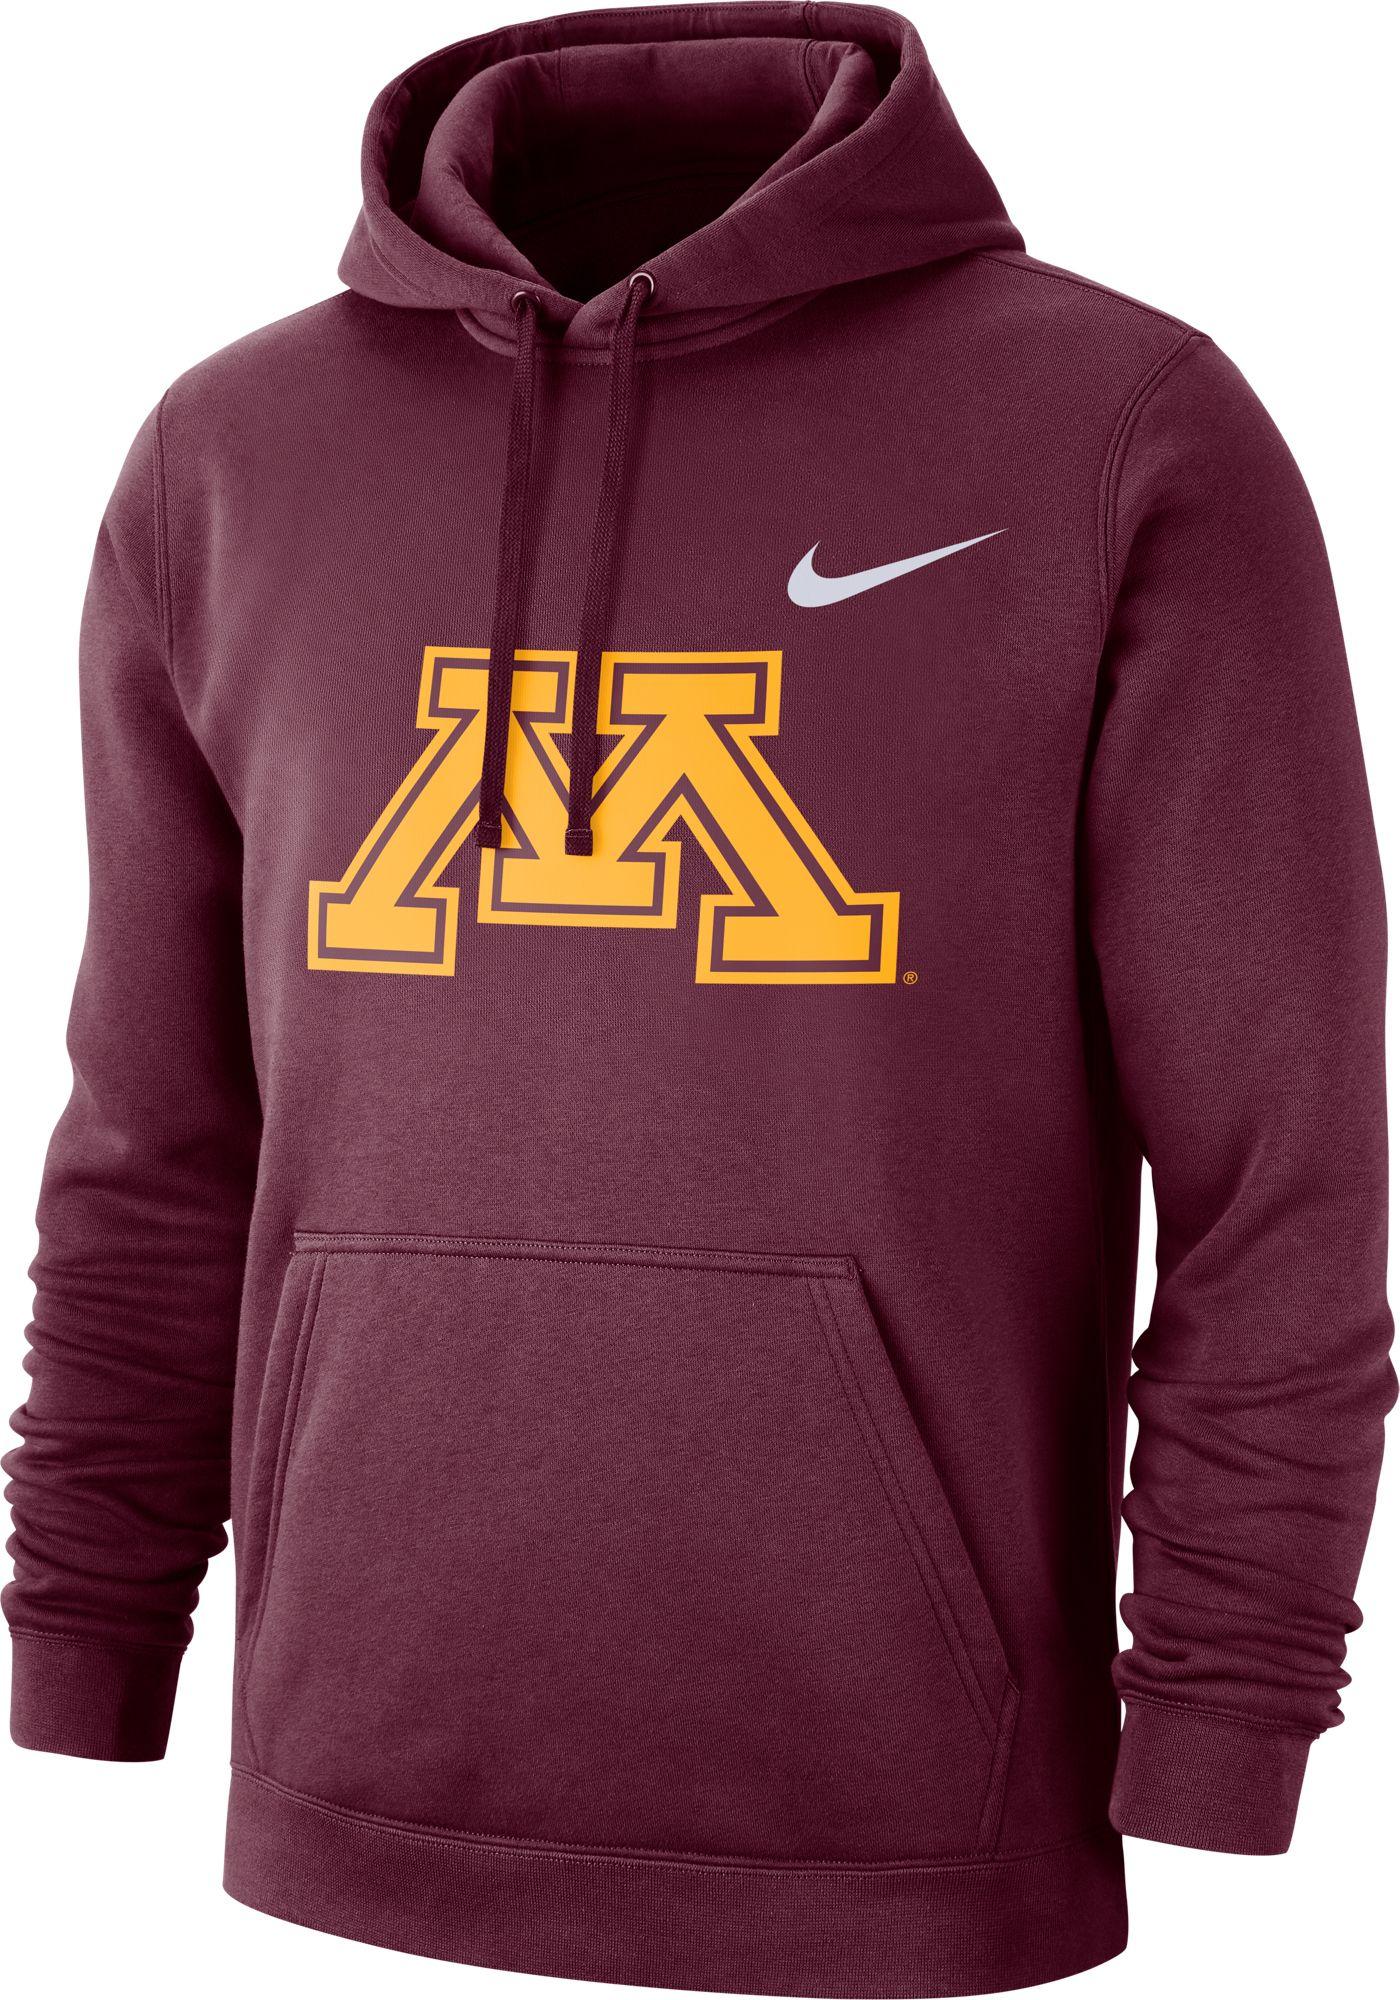 Nike Men's Minnesota Golden Gophers Maroon Club Fleece Pullover Hoodie